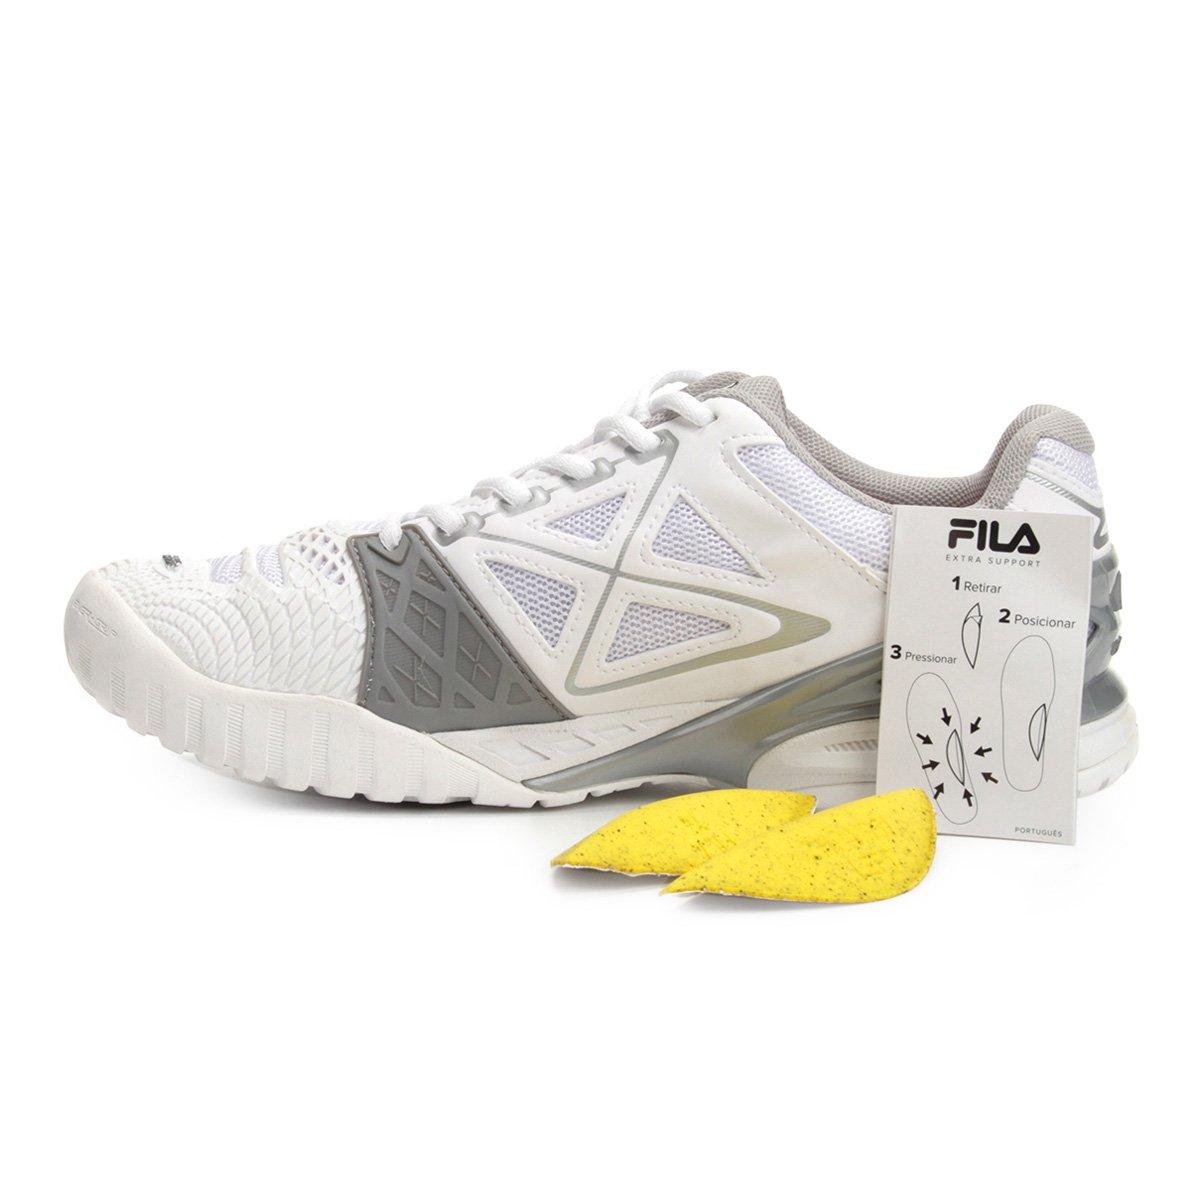 Tênis Fila Cage Delirium Indoor 2 Feminino - Branco e prata - Compre ... c9343cdd29ef9